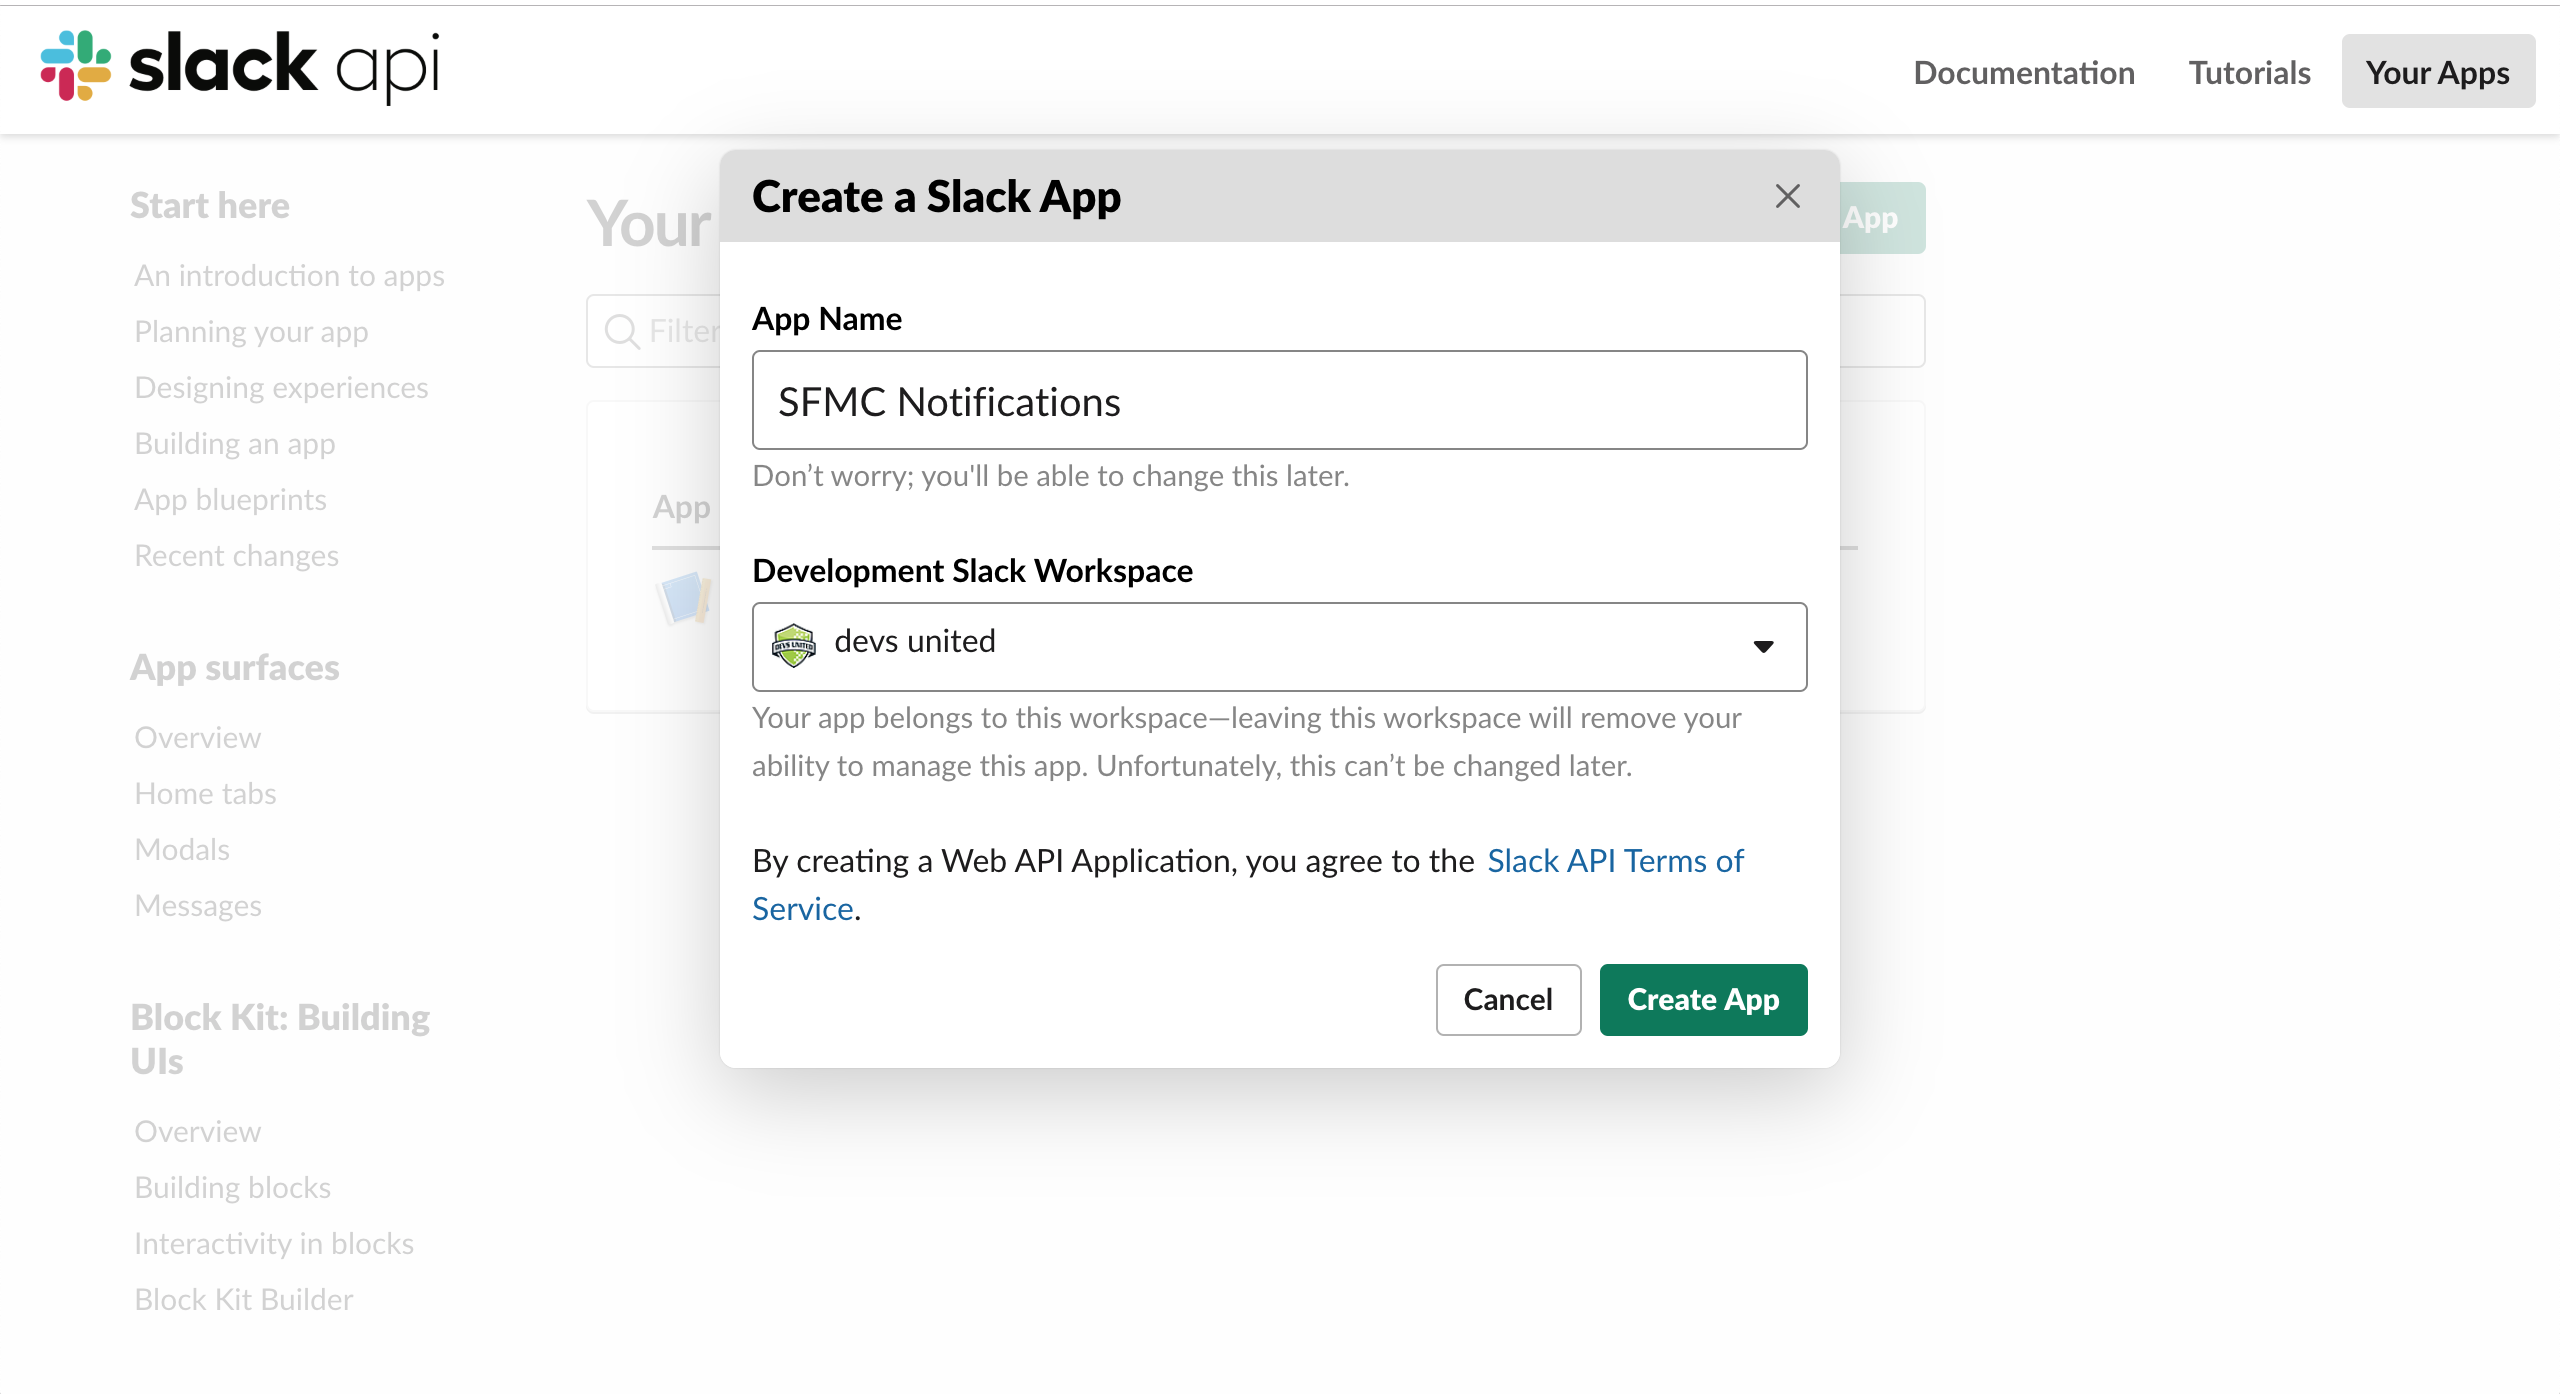 Creating a new Slack App